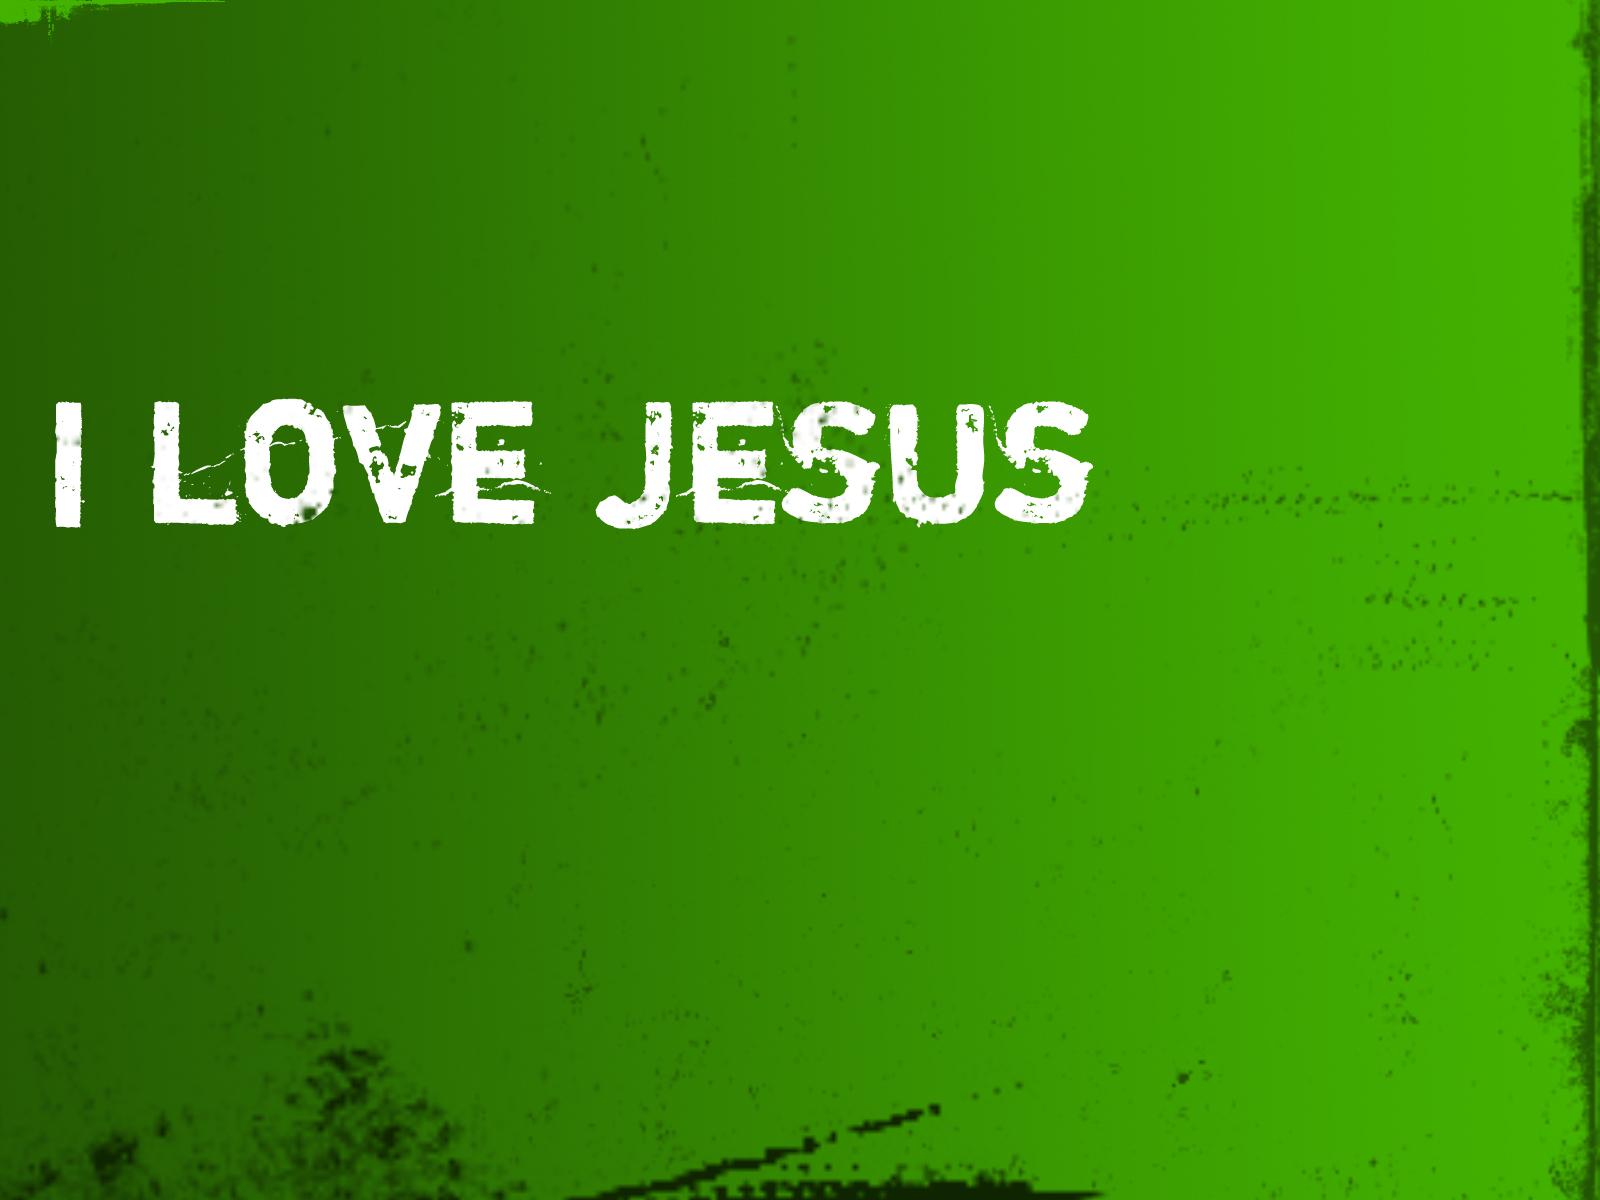 http://2.bp.blogspot.com/-GS-Dp6KKs8k/TeAW_MKeMsI/AAAAAAAAAAo/9rFwdnT5Z-E/s1600/love_jesus_wallpaper.jpg